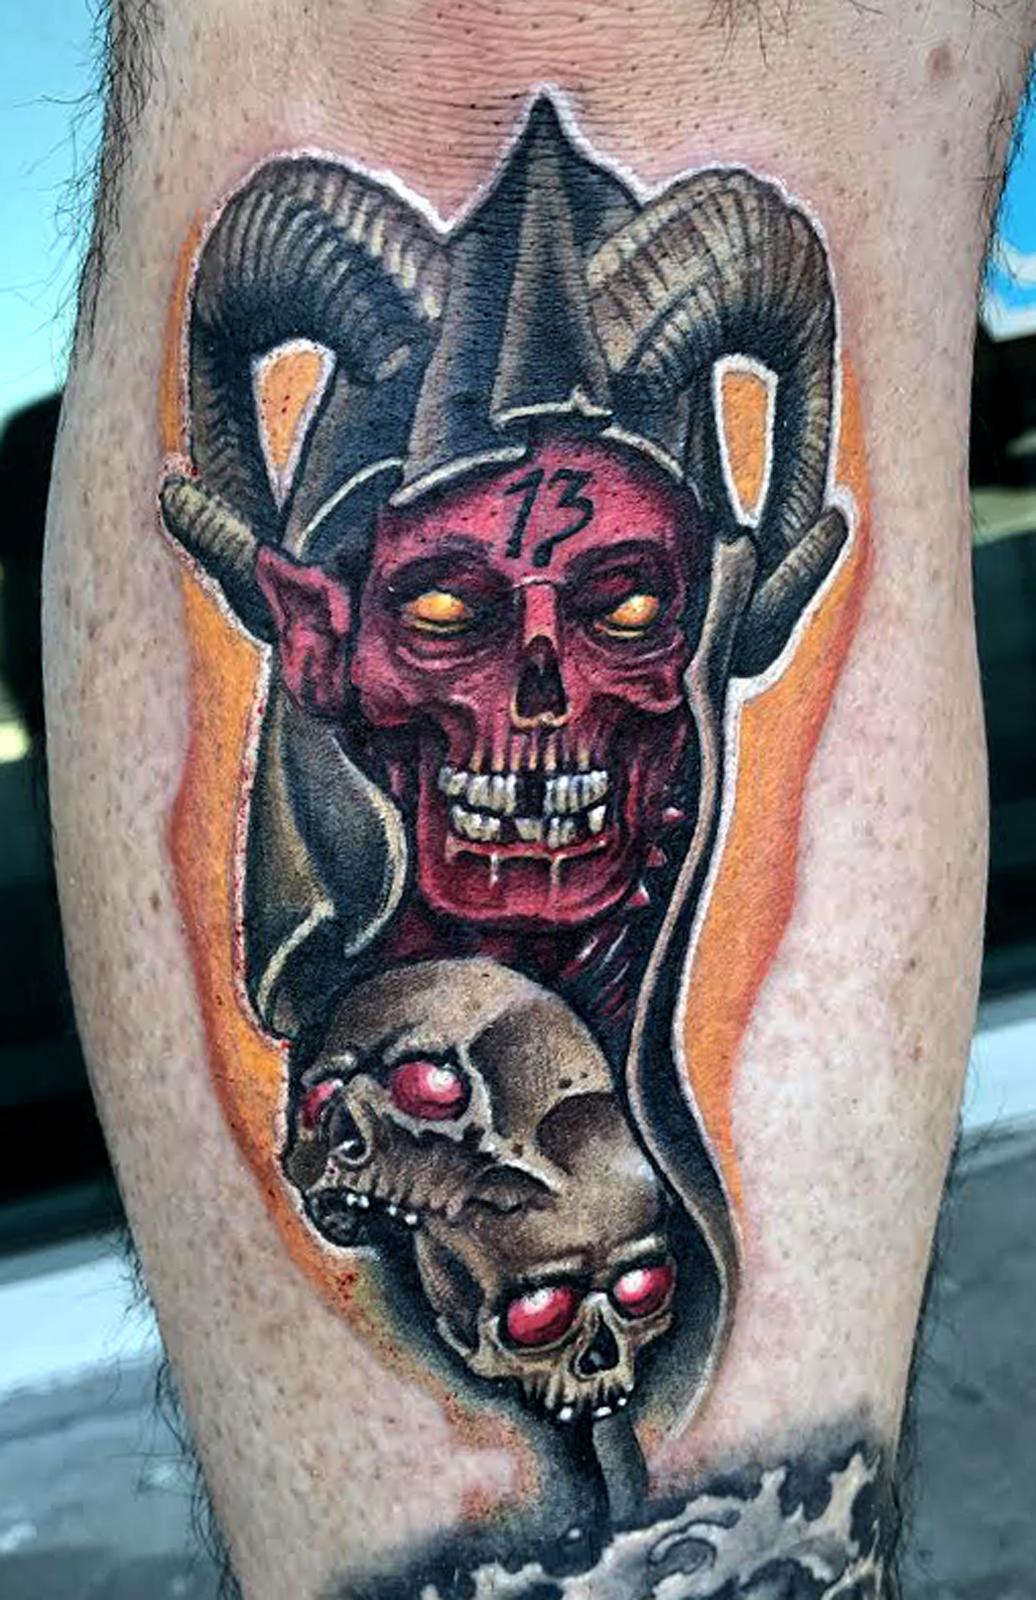 Demonic Tattoo by Krystof